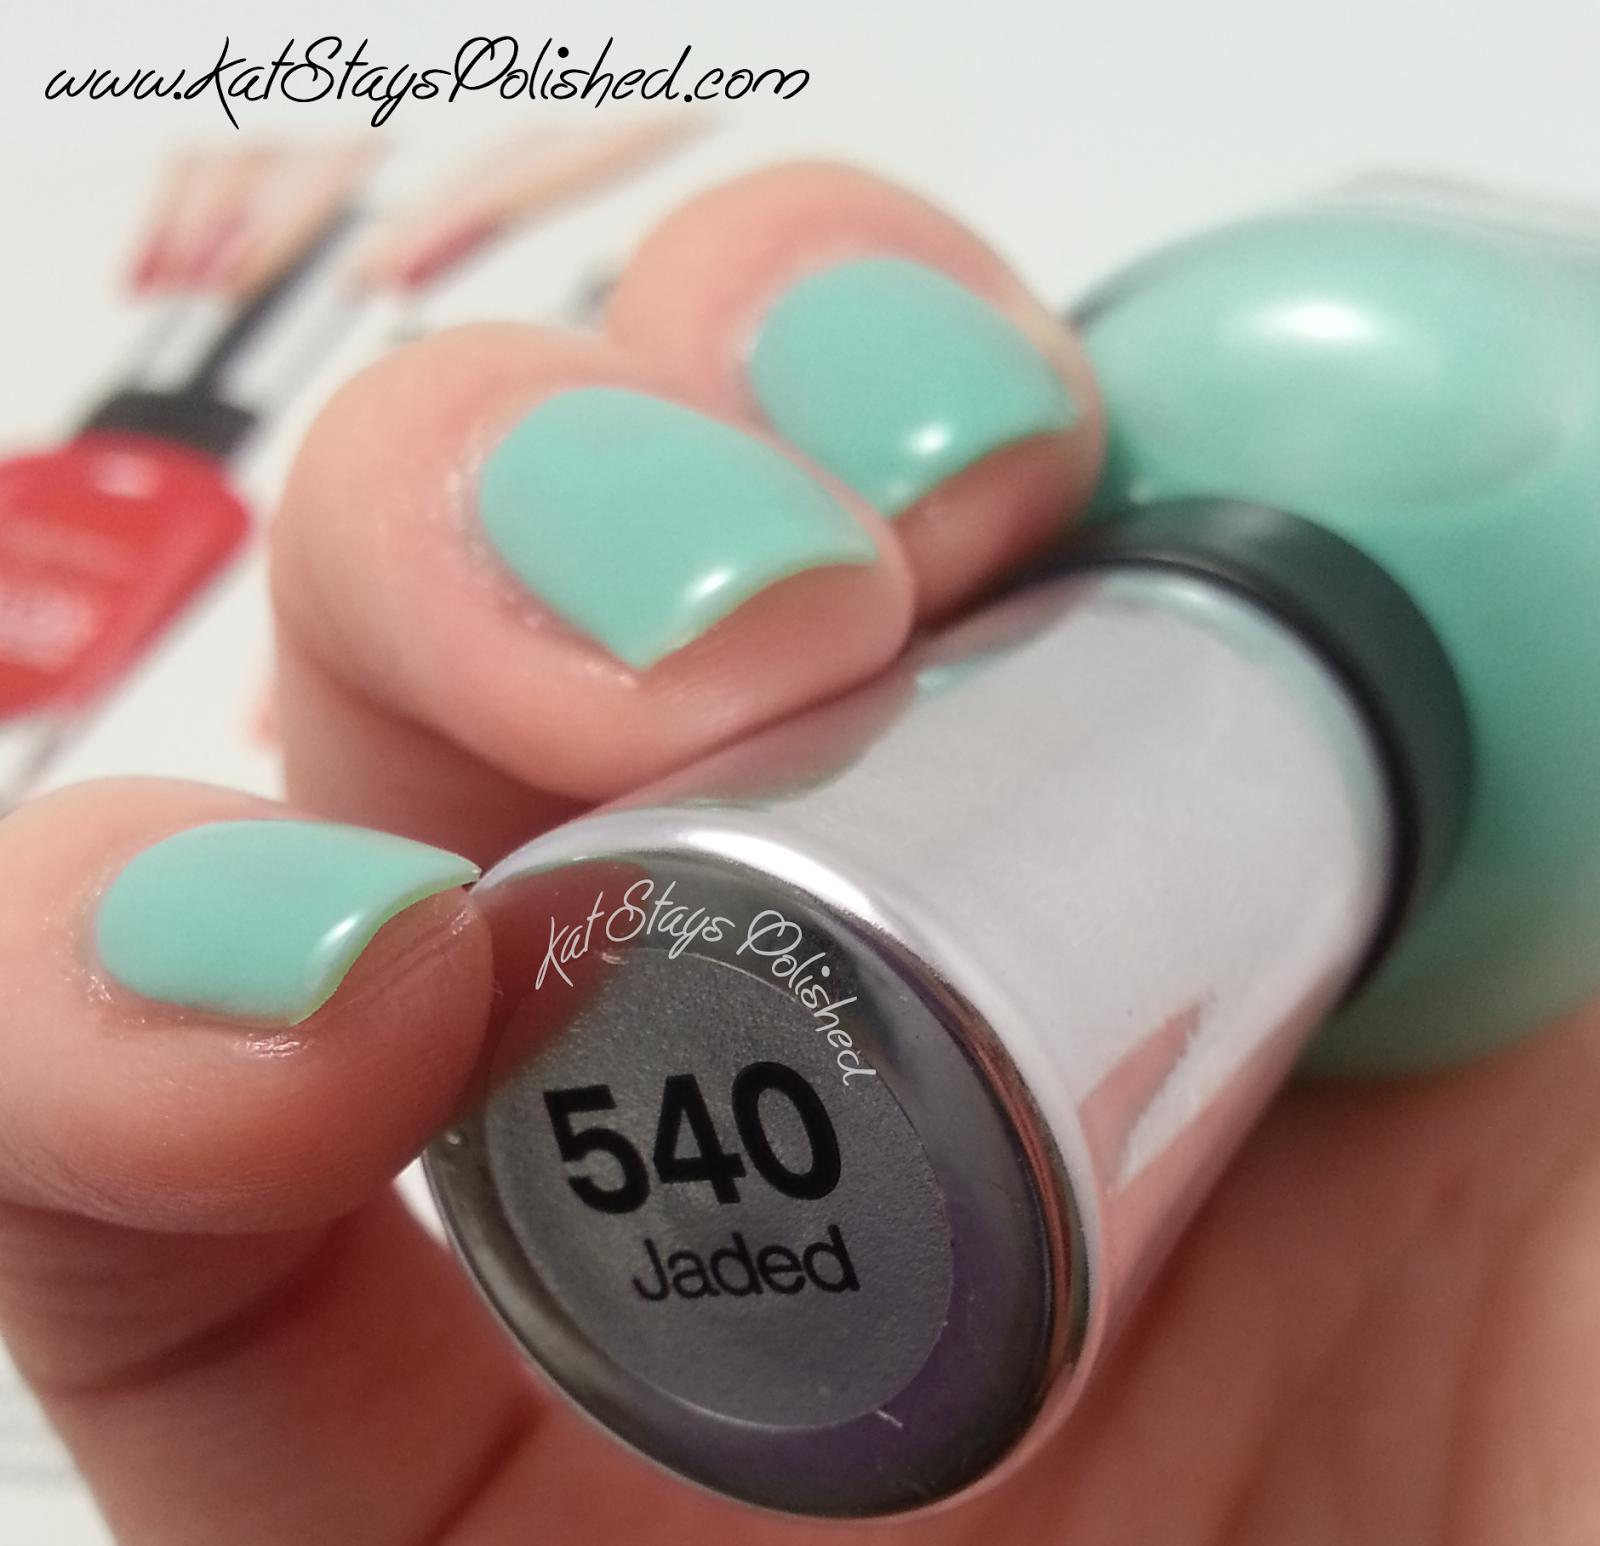 SallyHansen: Complete Salon Manicure - Jaded